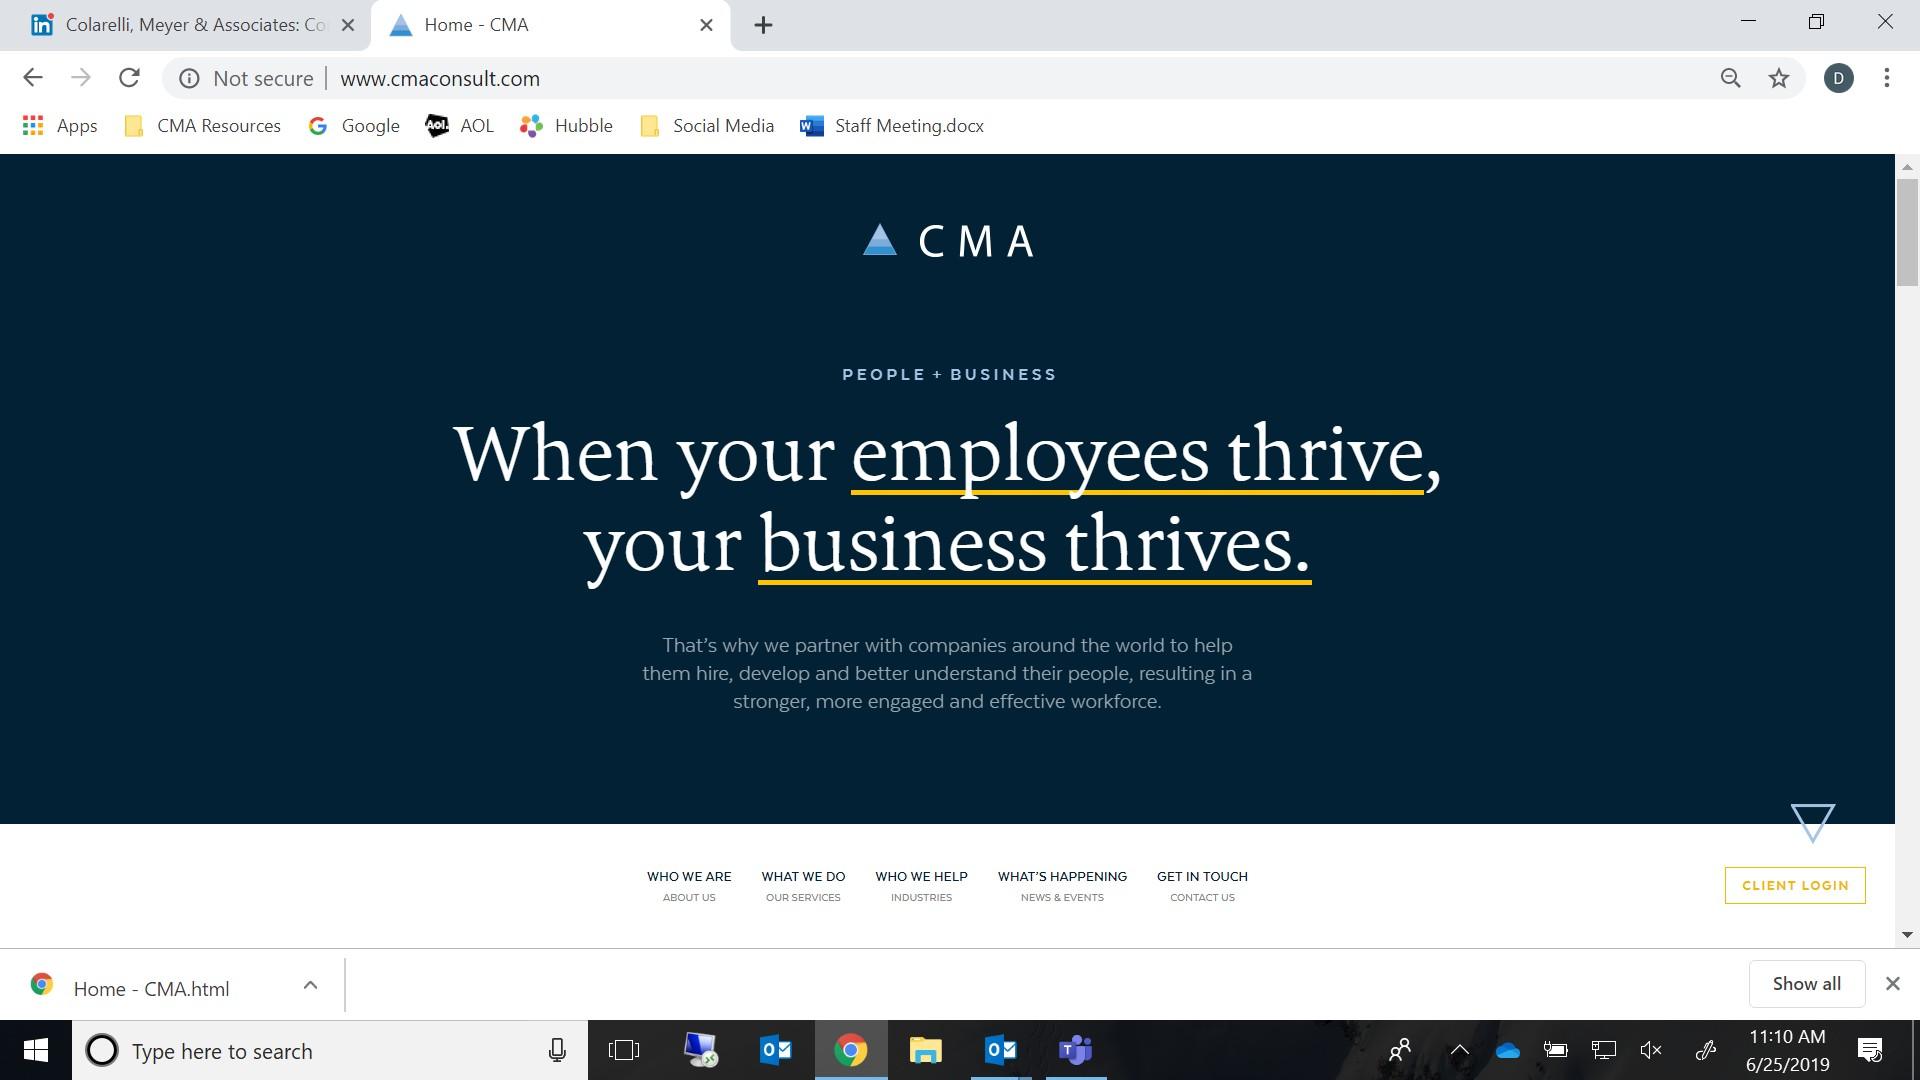 CMA (Colarelli, Meyer & Assoc )   LinkedIn